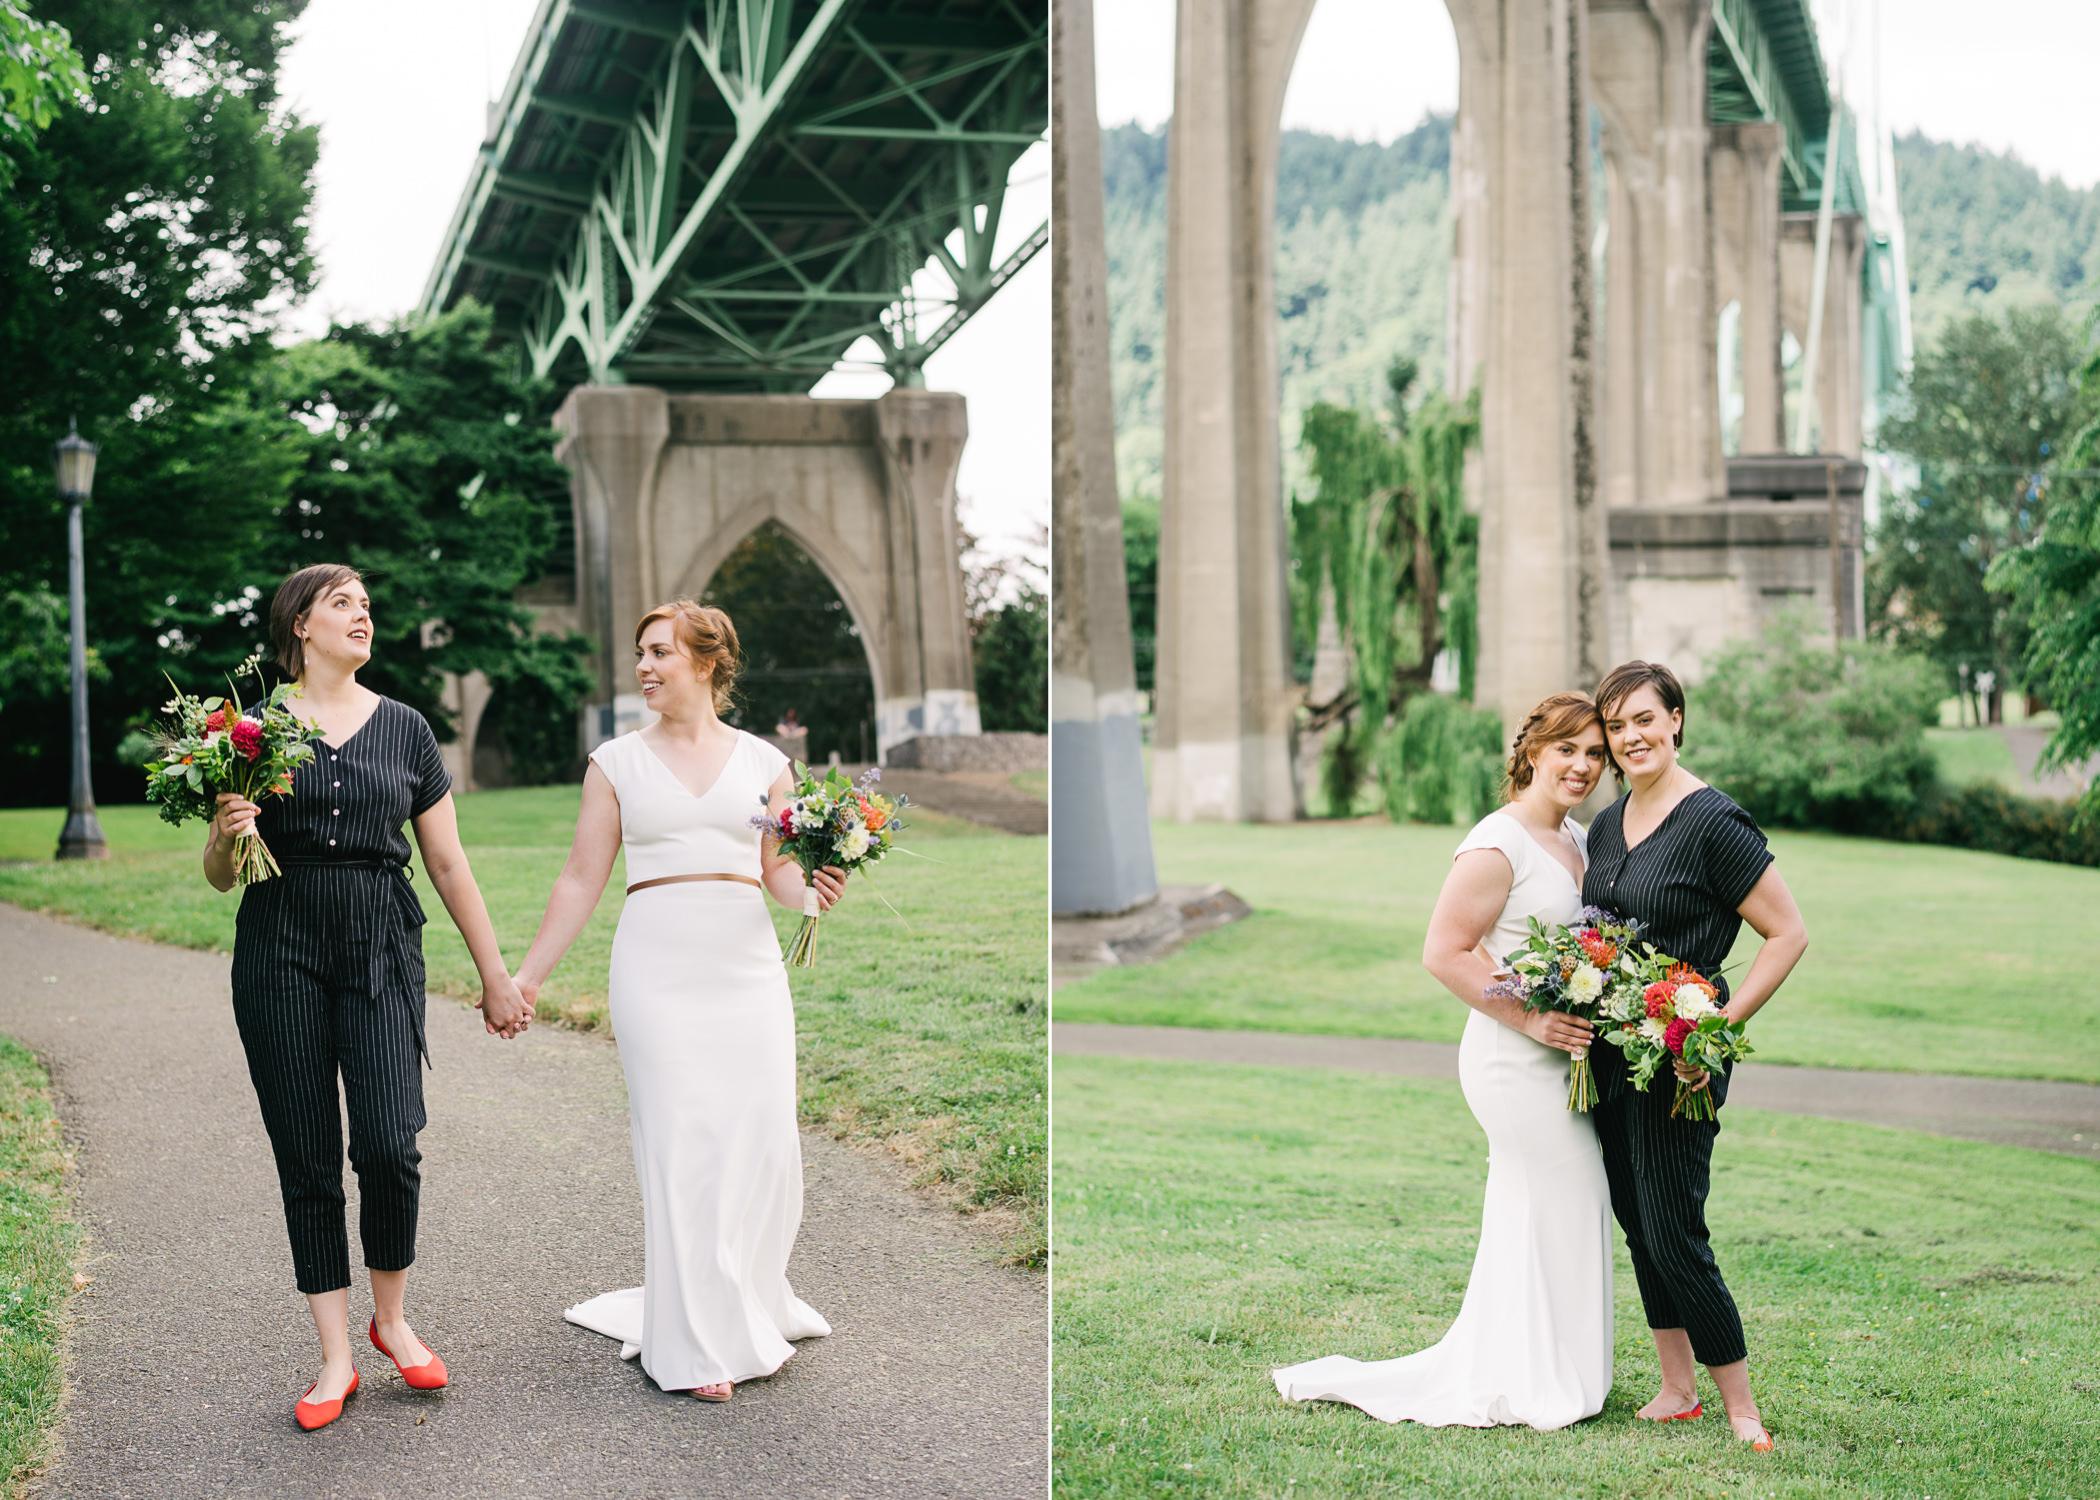 cathedral-park-portland-elopement-gay-wedding-044.JPG